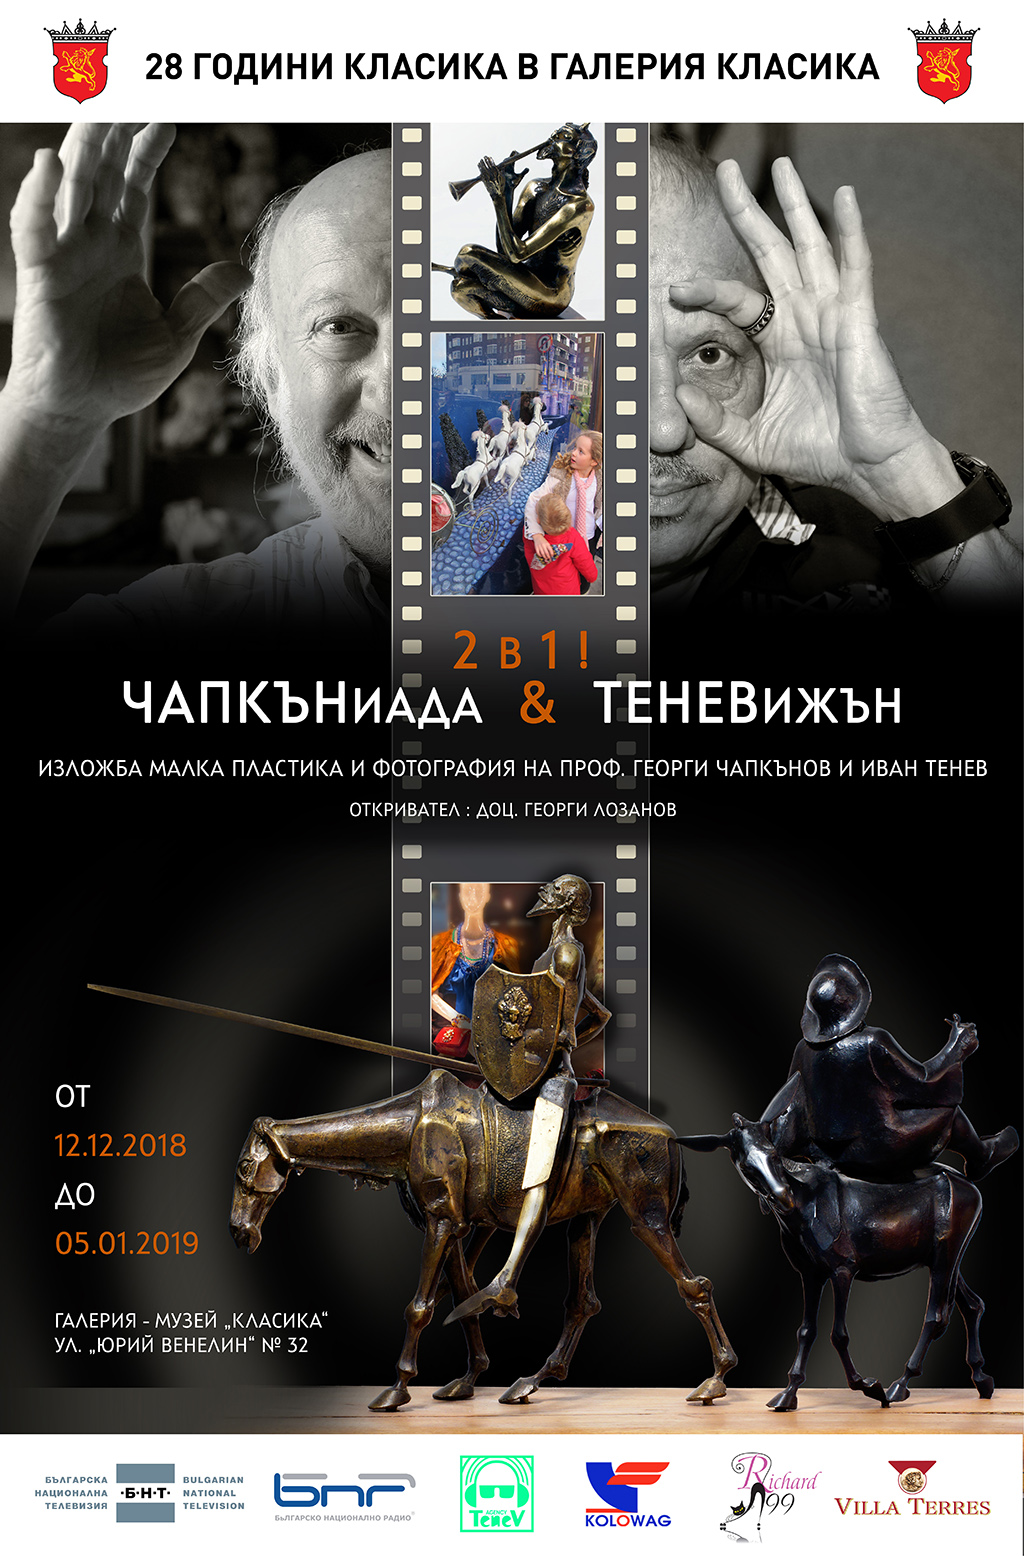 Tenev+Chapkunov Gallery Poster 2018-12-lores